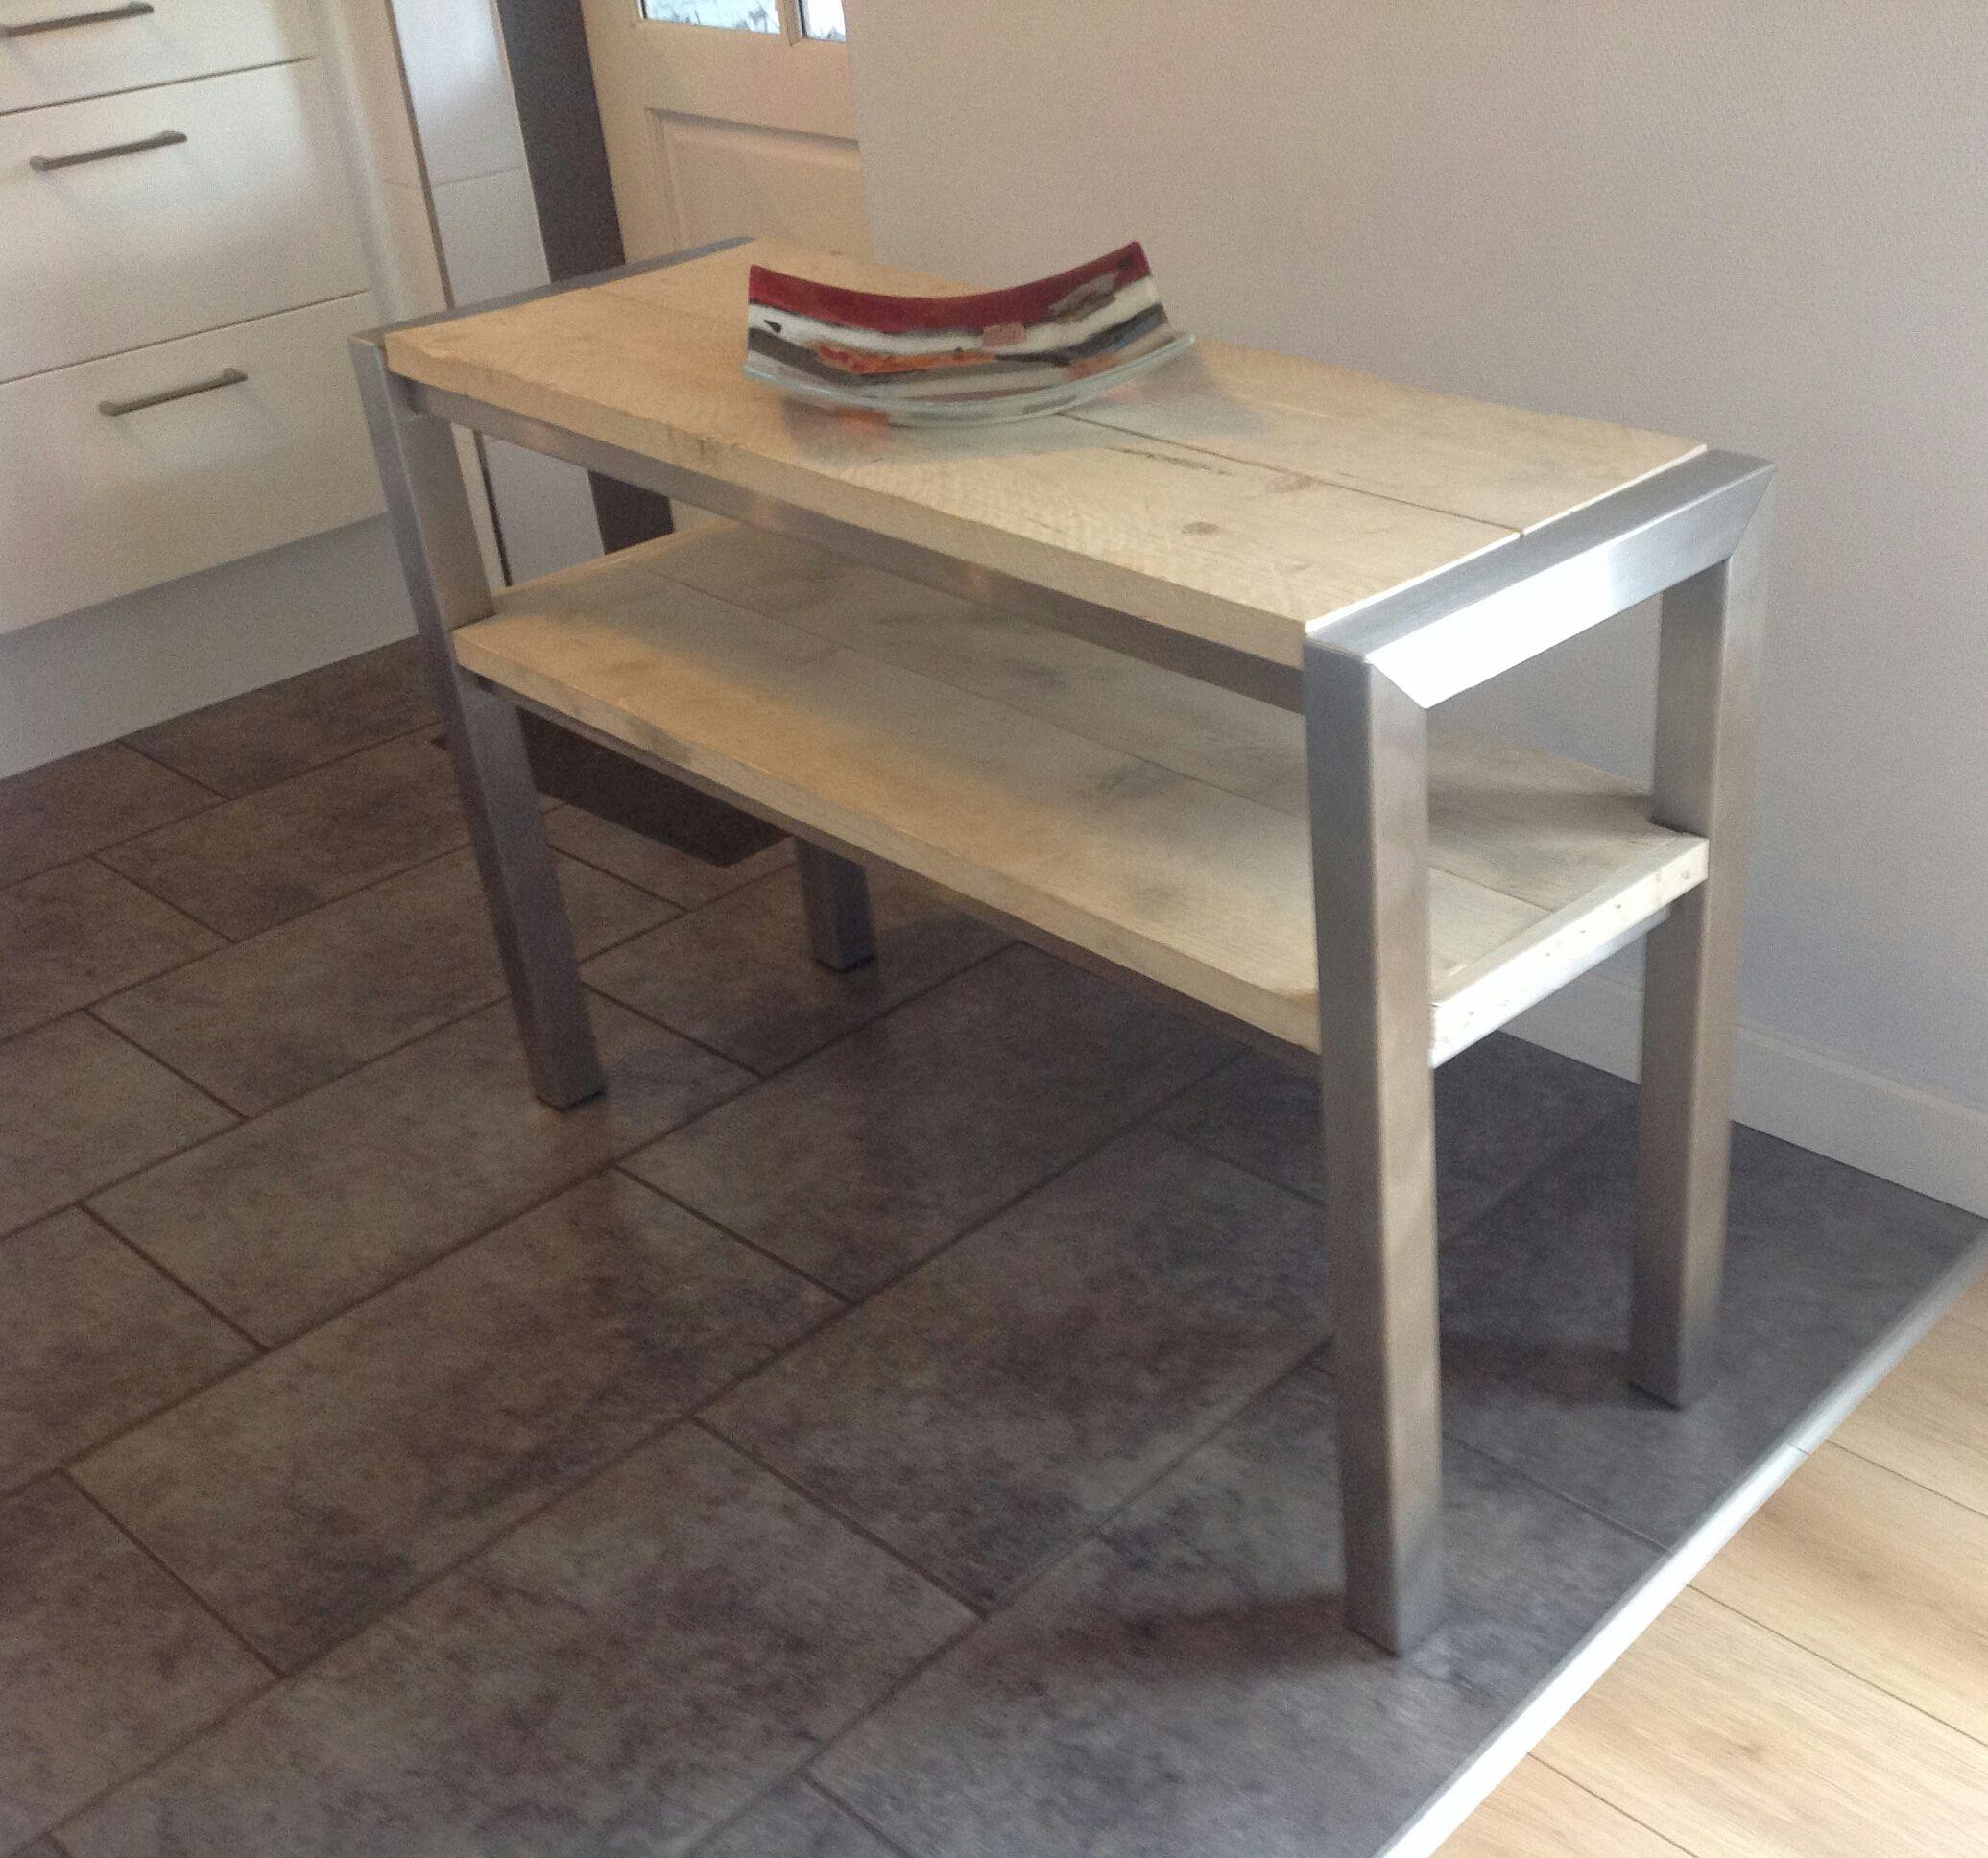 Sidetable Buiten Rvs.Rvs Side Table Schaapman Rvs Design Rvs En Tafels